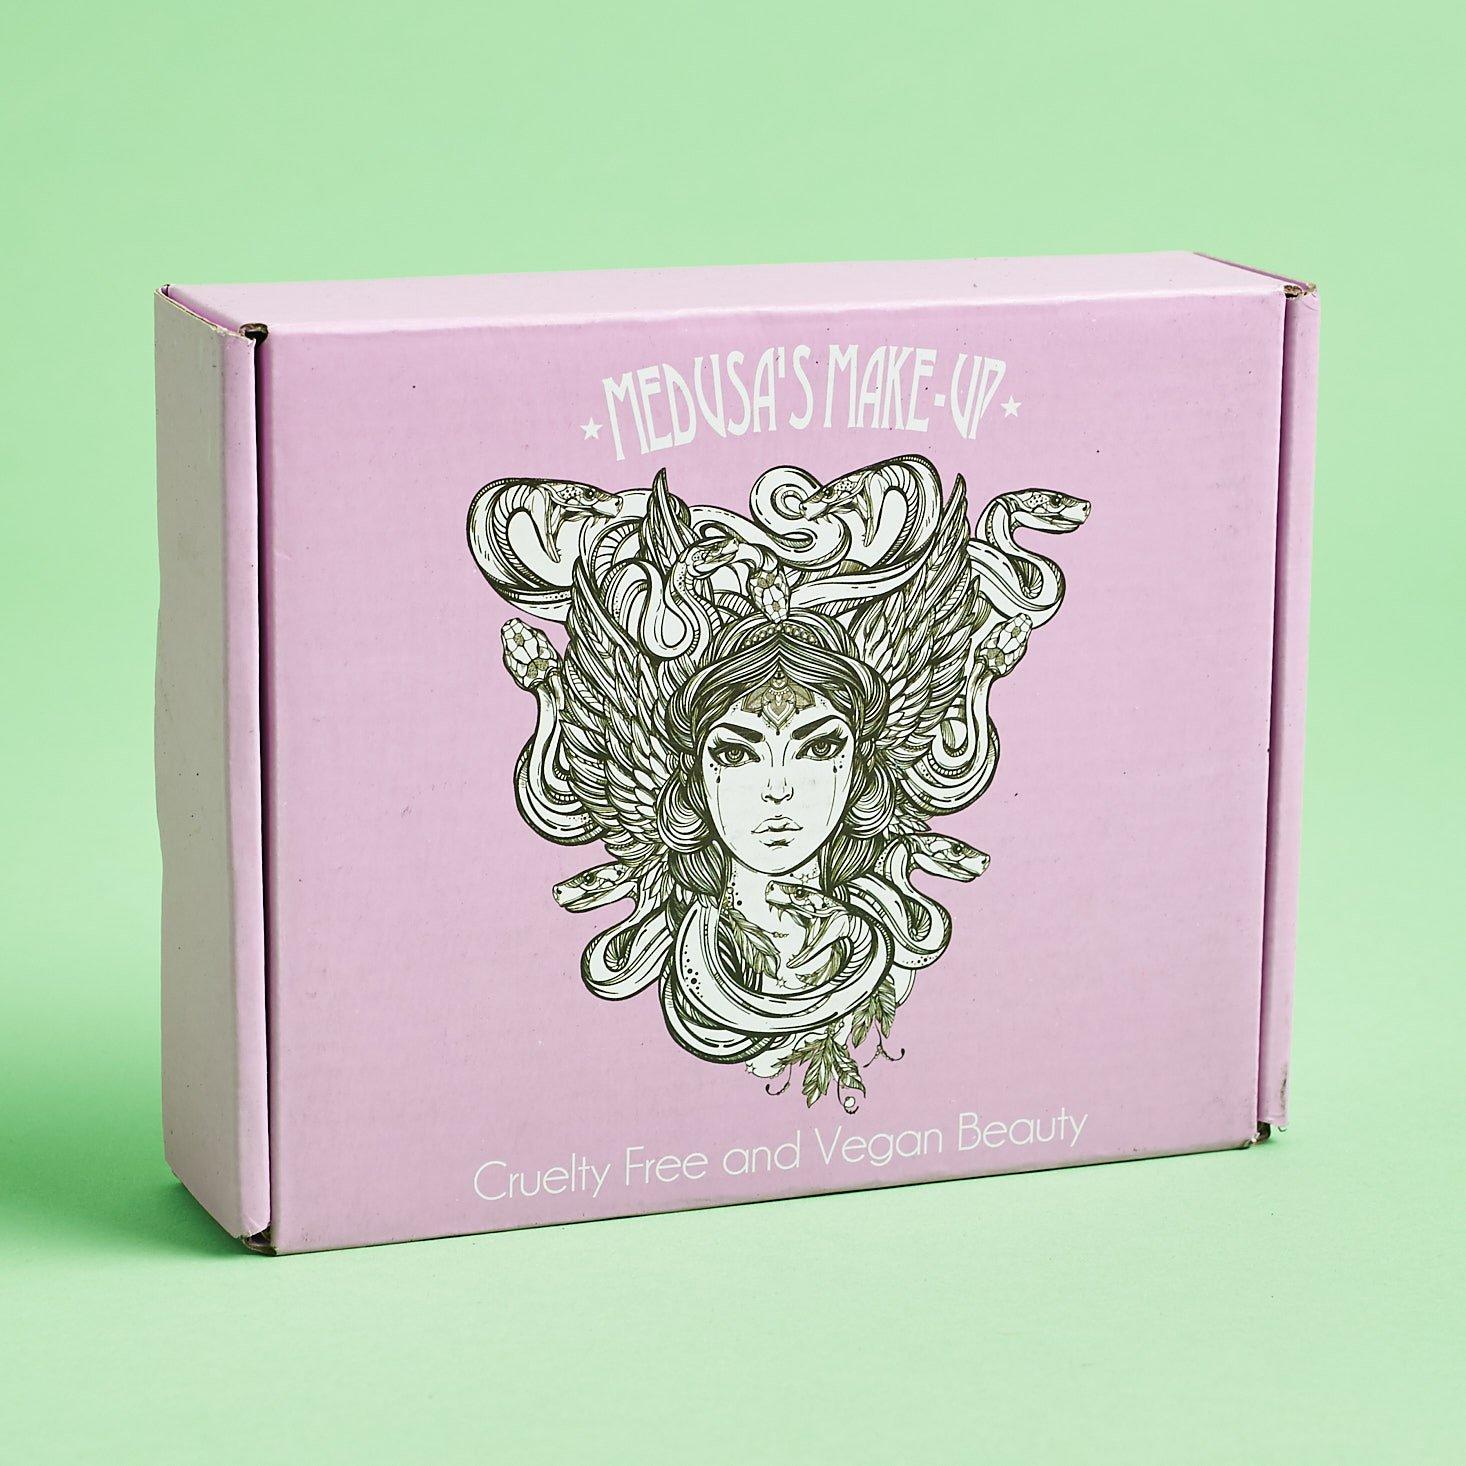 Medusa S Make Up Beauty Box Review March 2019 Msa